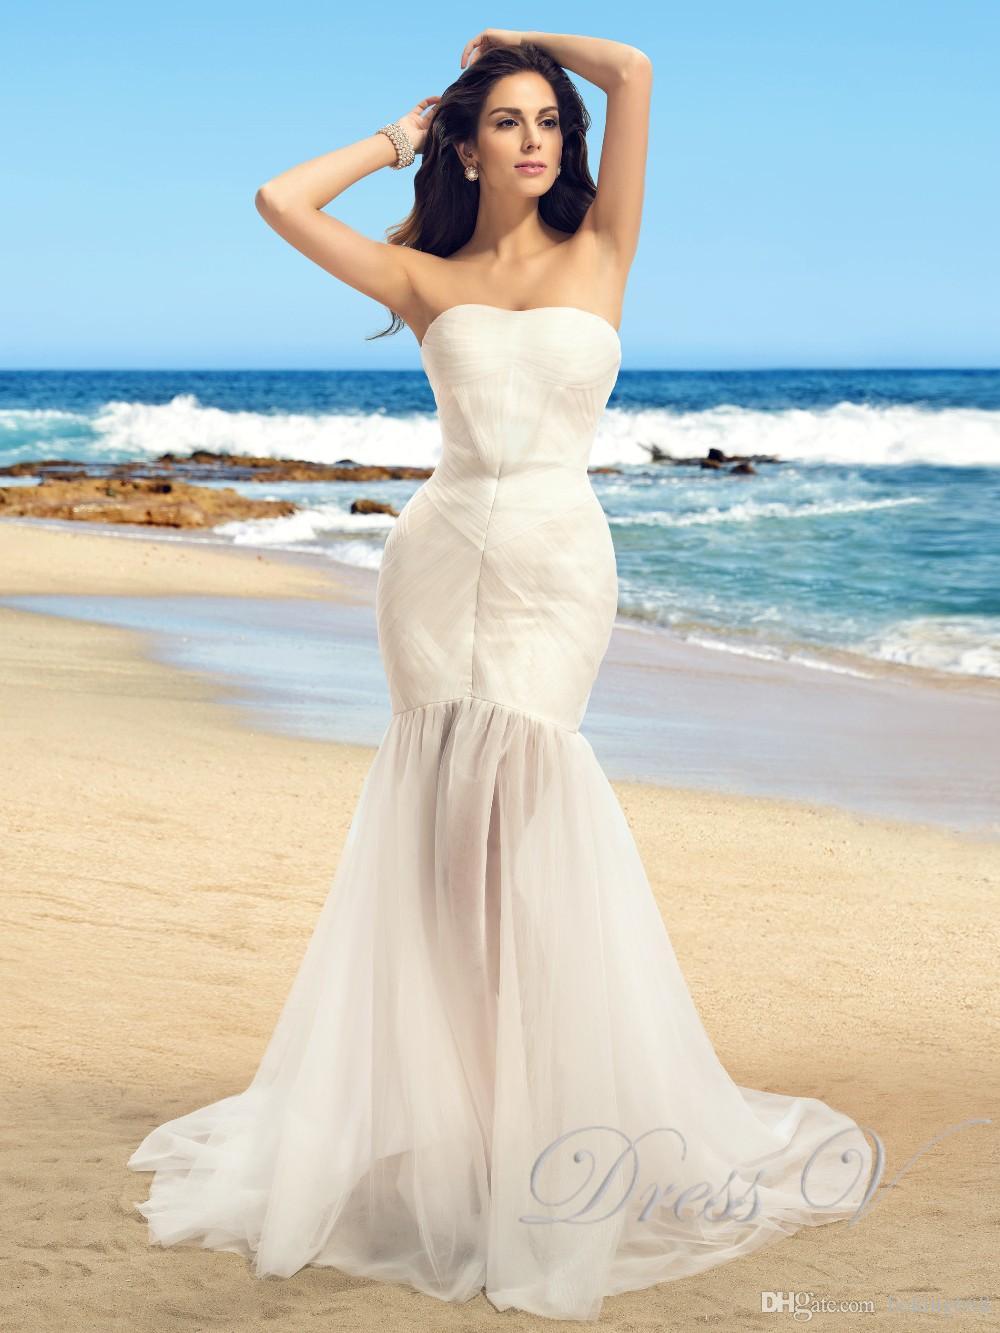 Discount Romantic Summer Beach Wedding Dresses 2017 ...